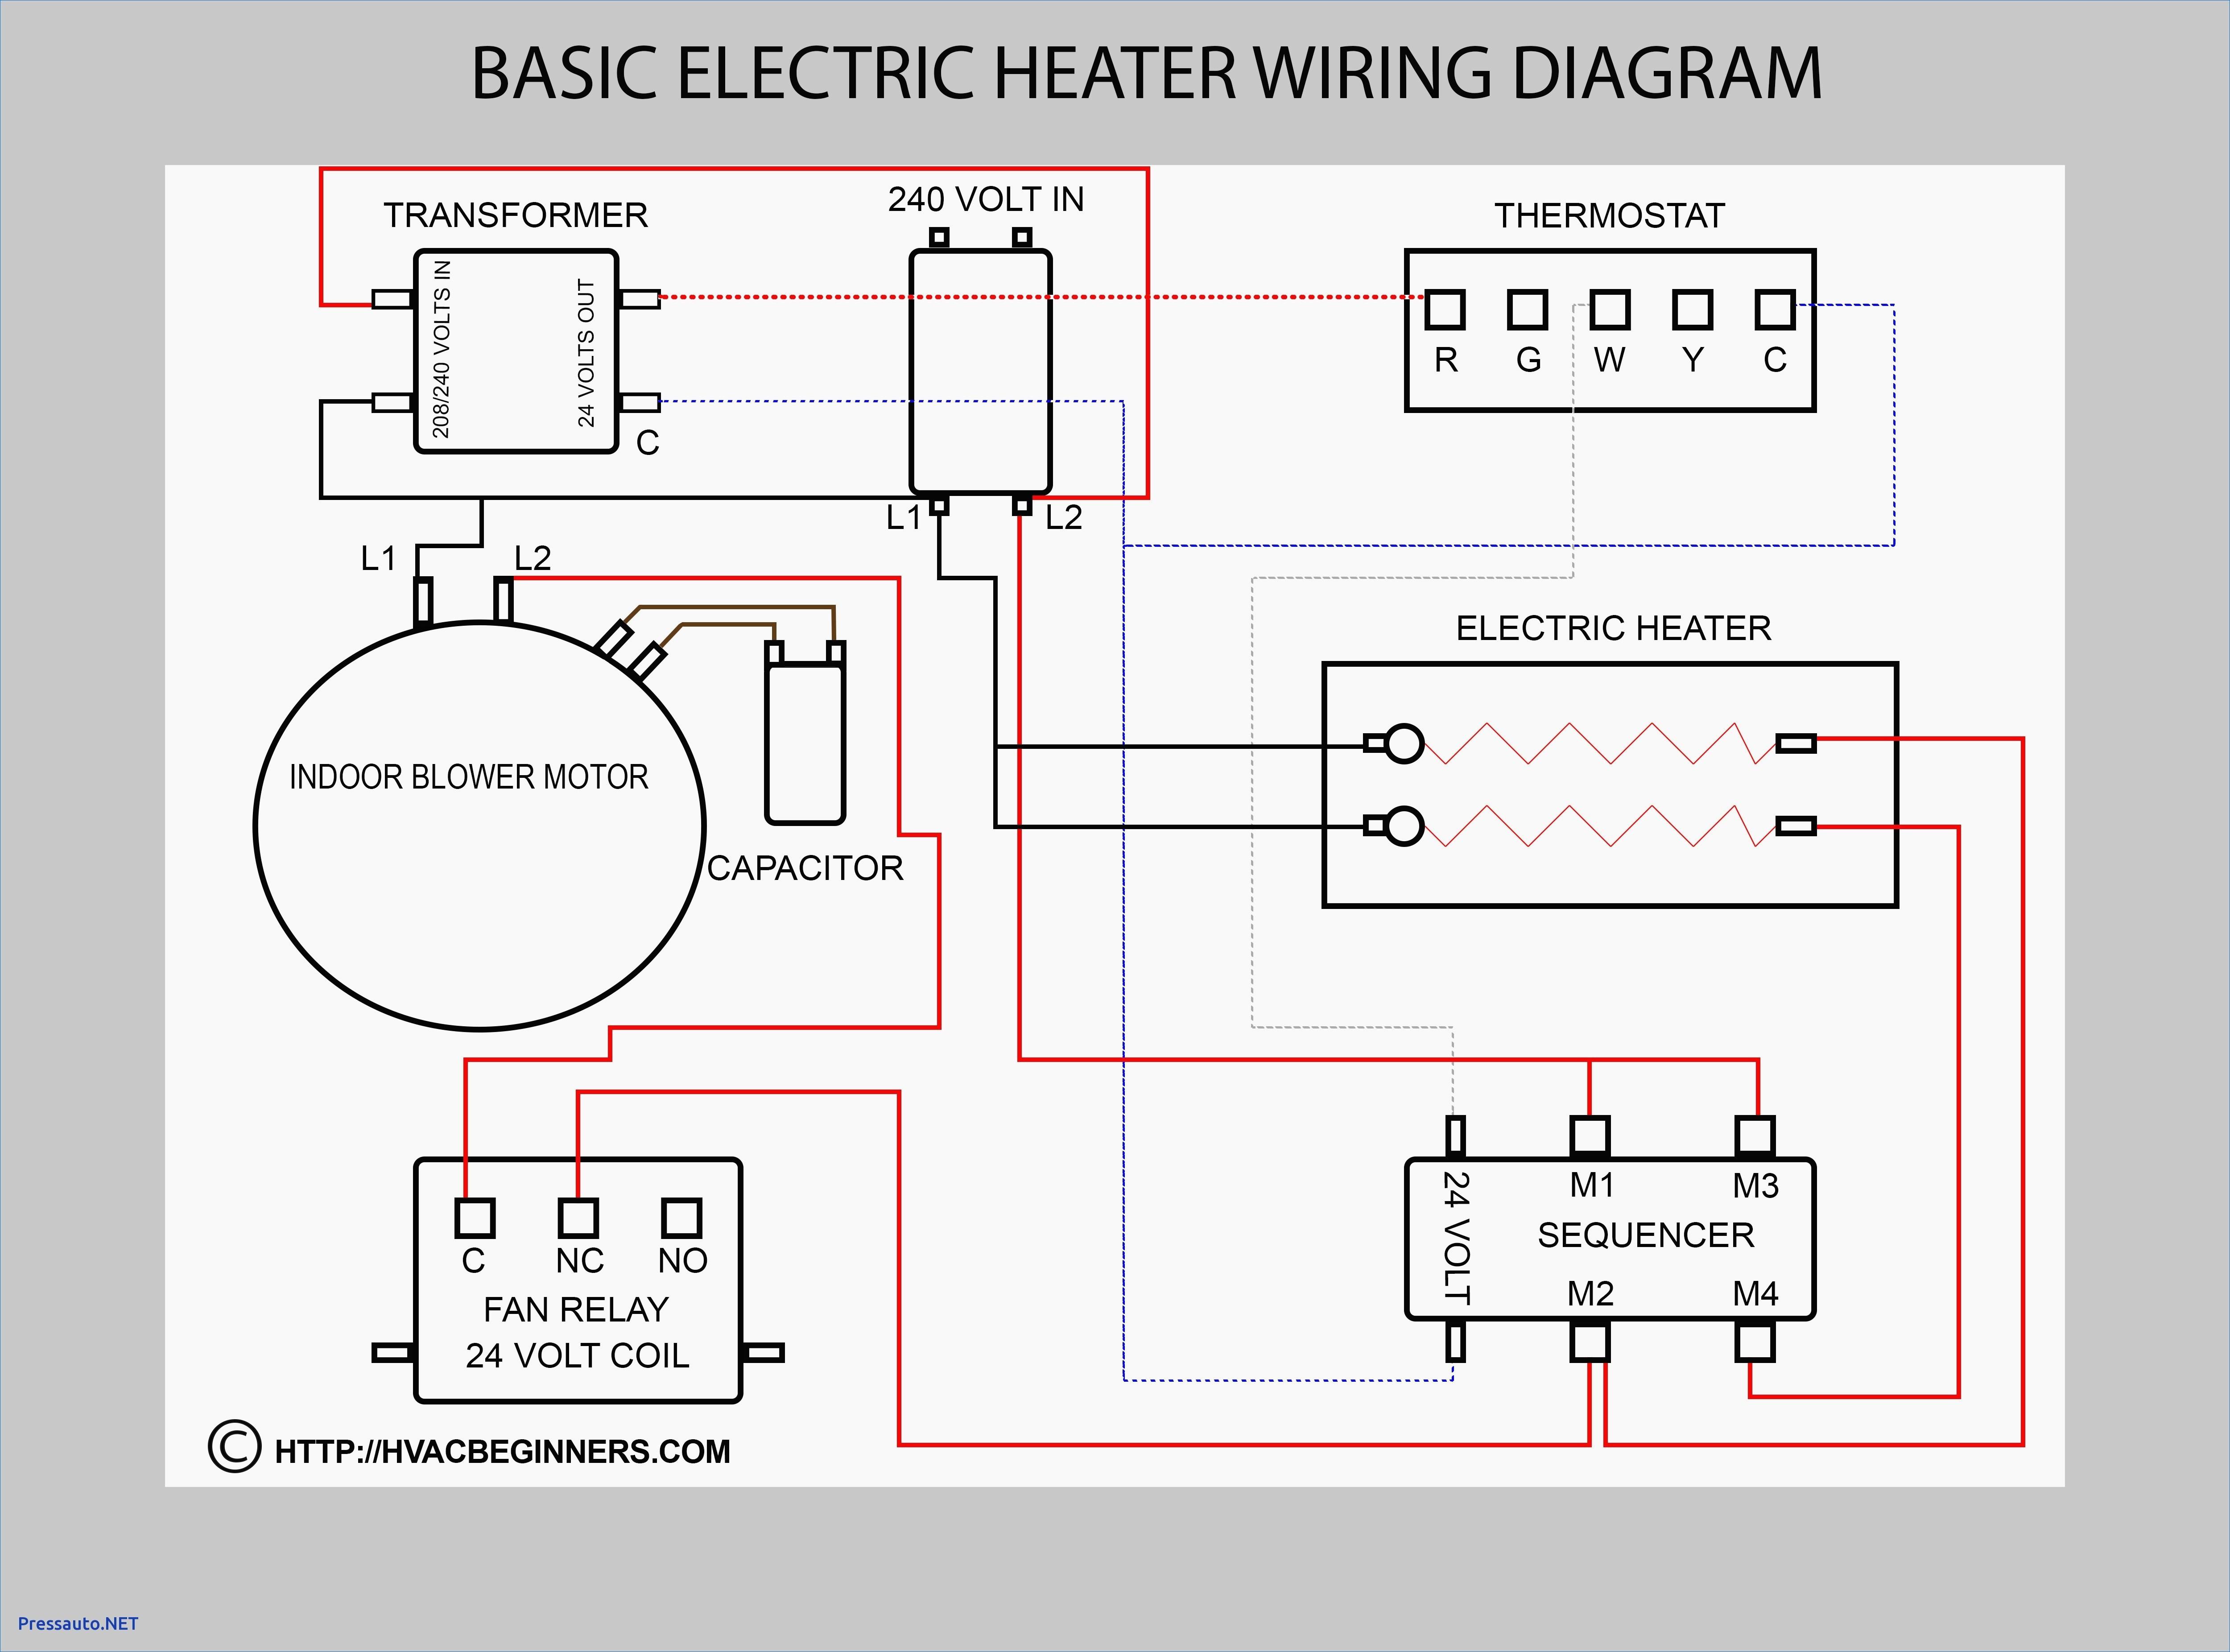 Welding Plug Wiring Diagram - Wiring Diagram Schema - 220V Welder Plug Wiring Diagram